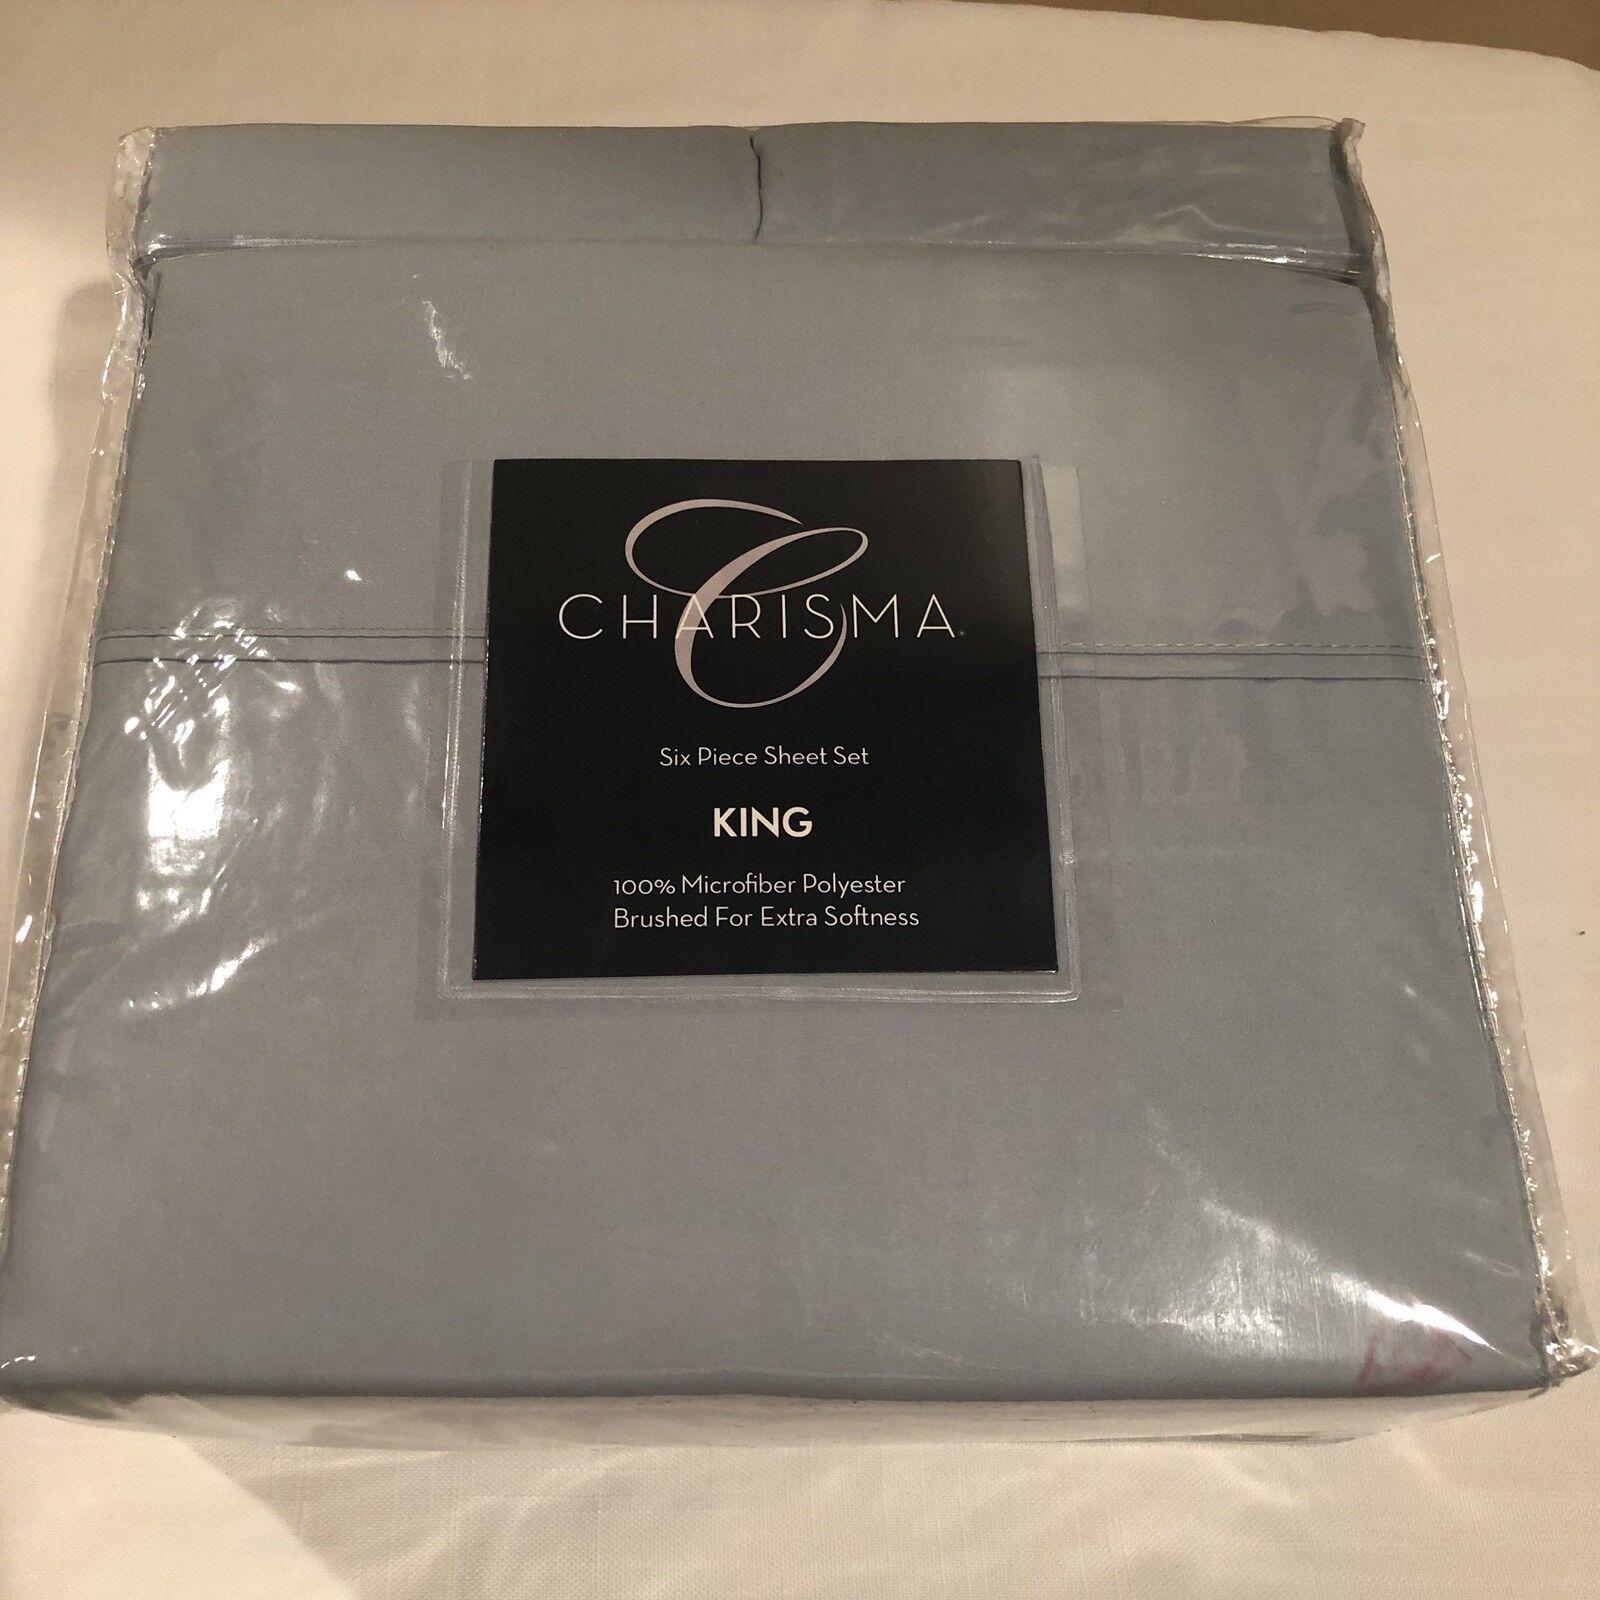 Charisma King Microfiber Polyester Six Piece Sheet Set blueeeee Free Shipping